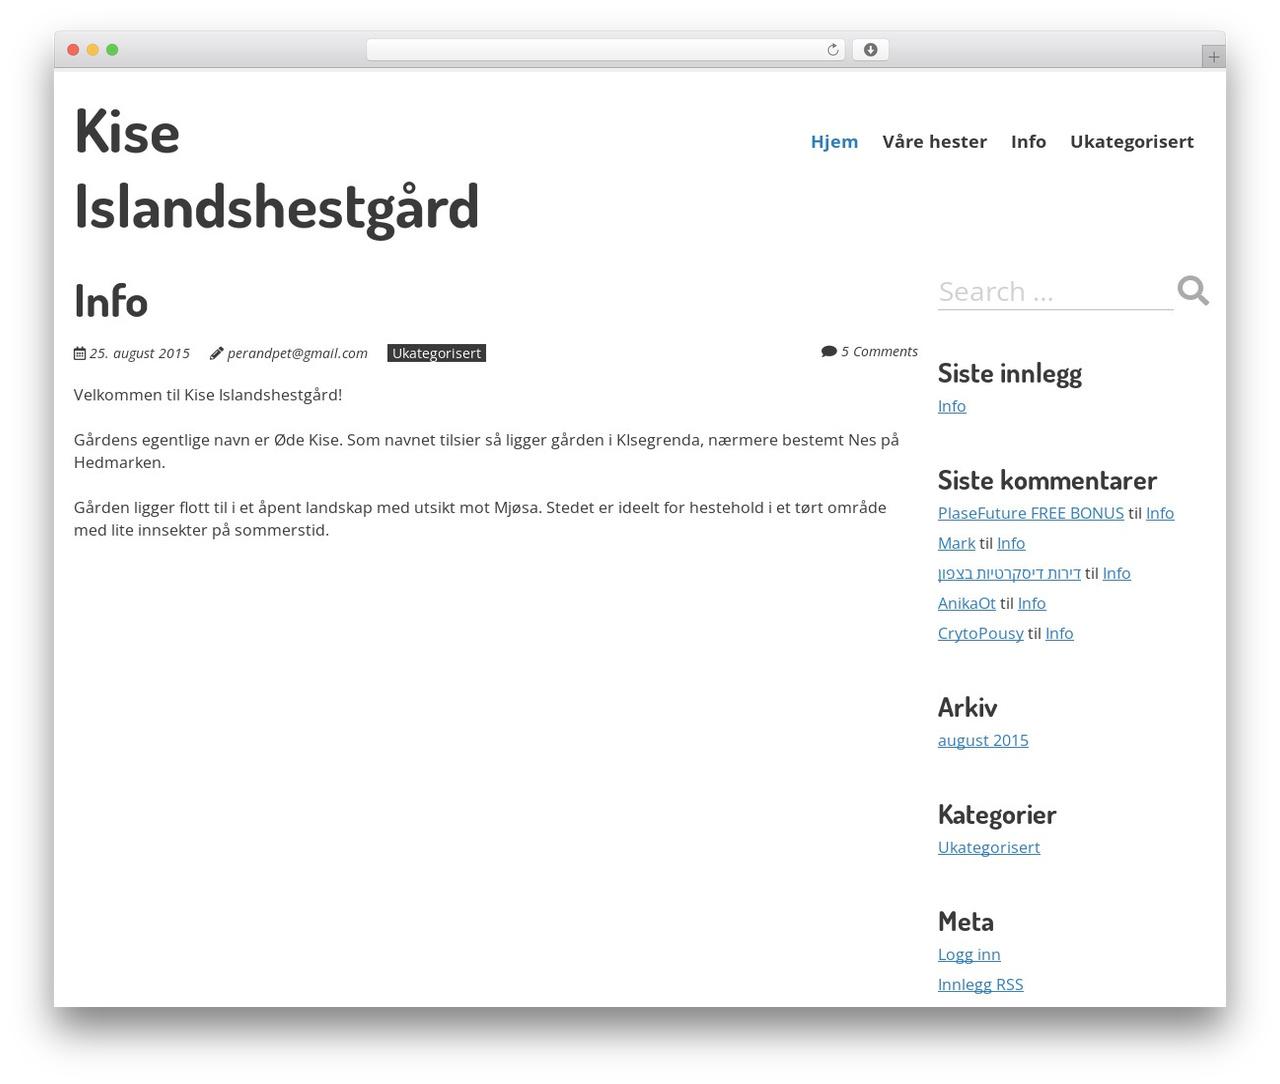 WordPress website template Ephemeris by ahortin - kiseis no